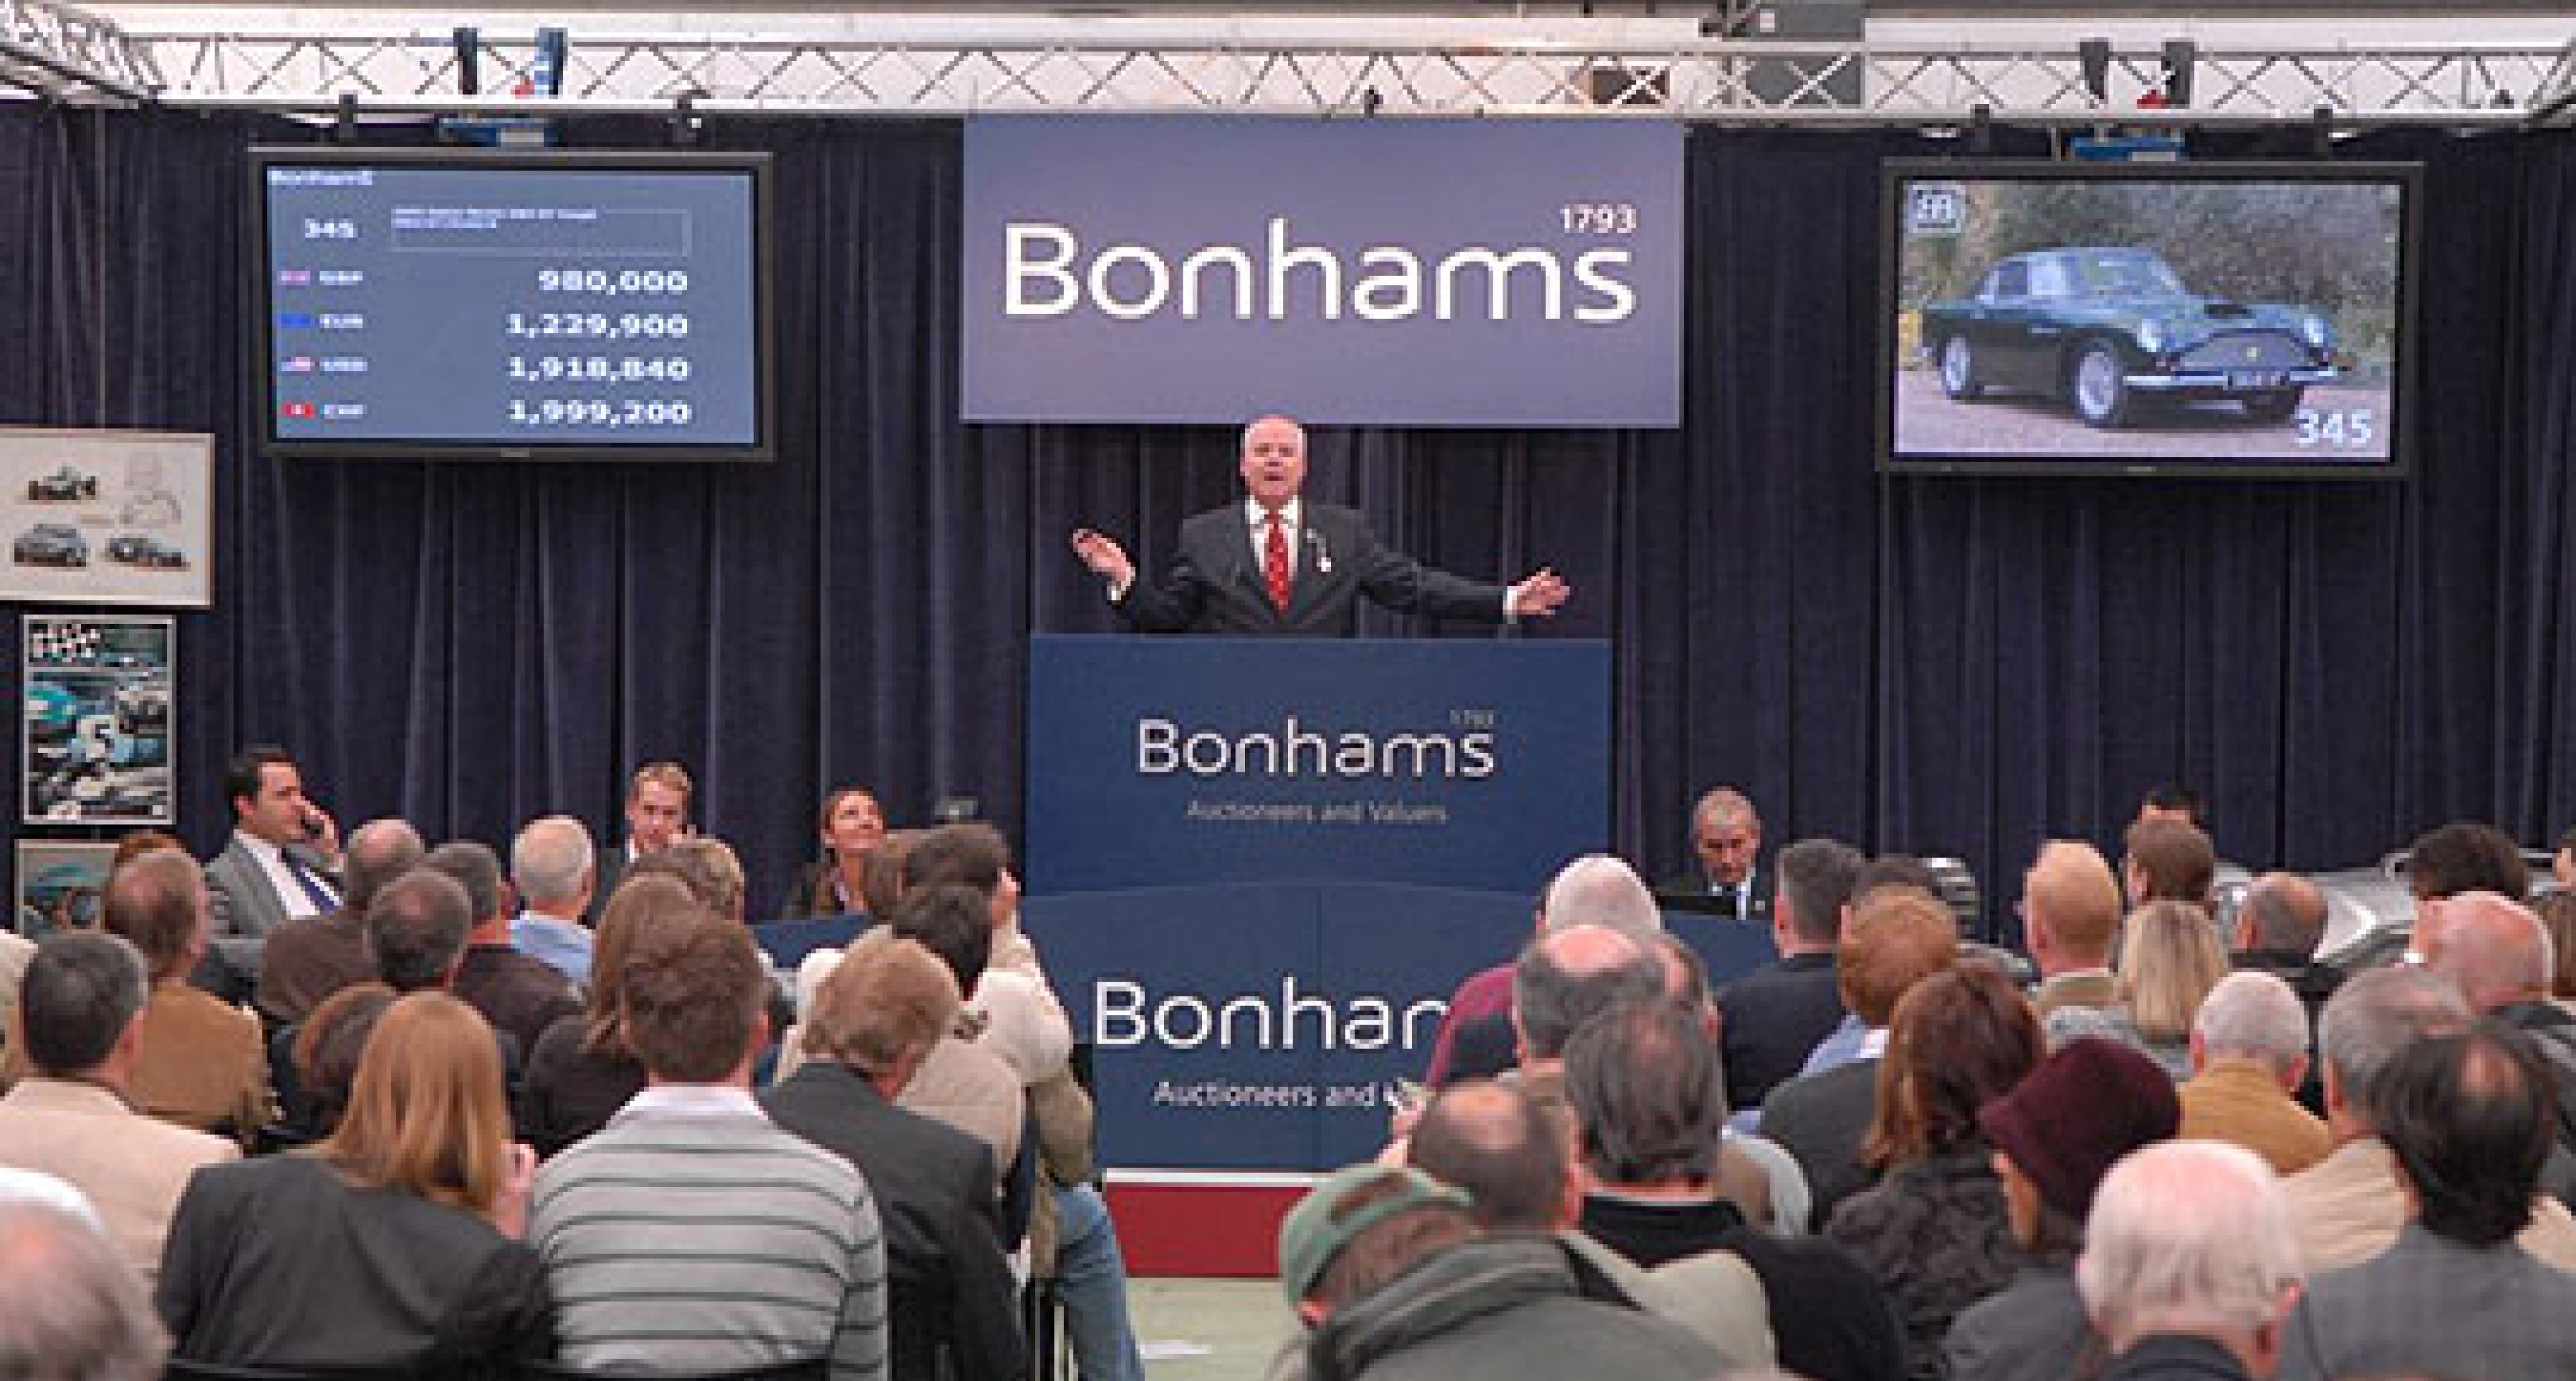 Bonhams Aston Martin Sale at Newport Pagnell - 17th May 2008 - Review